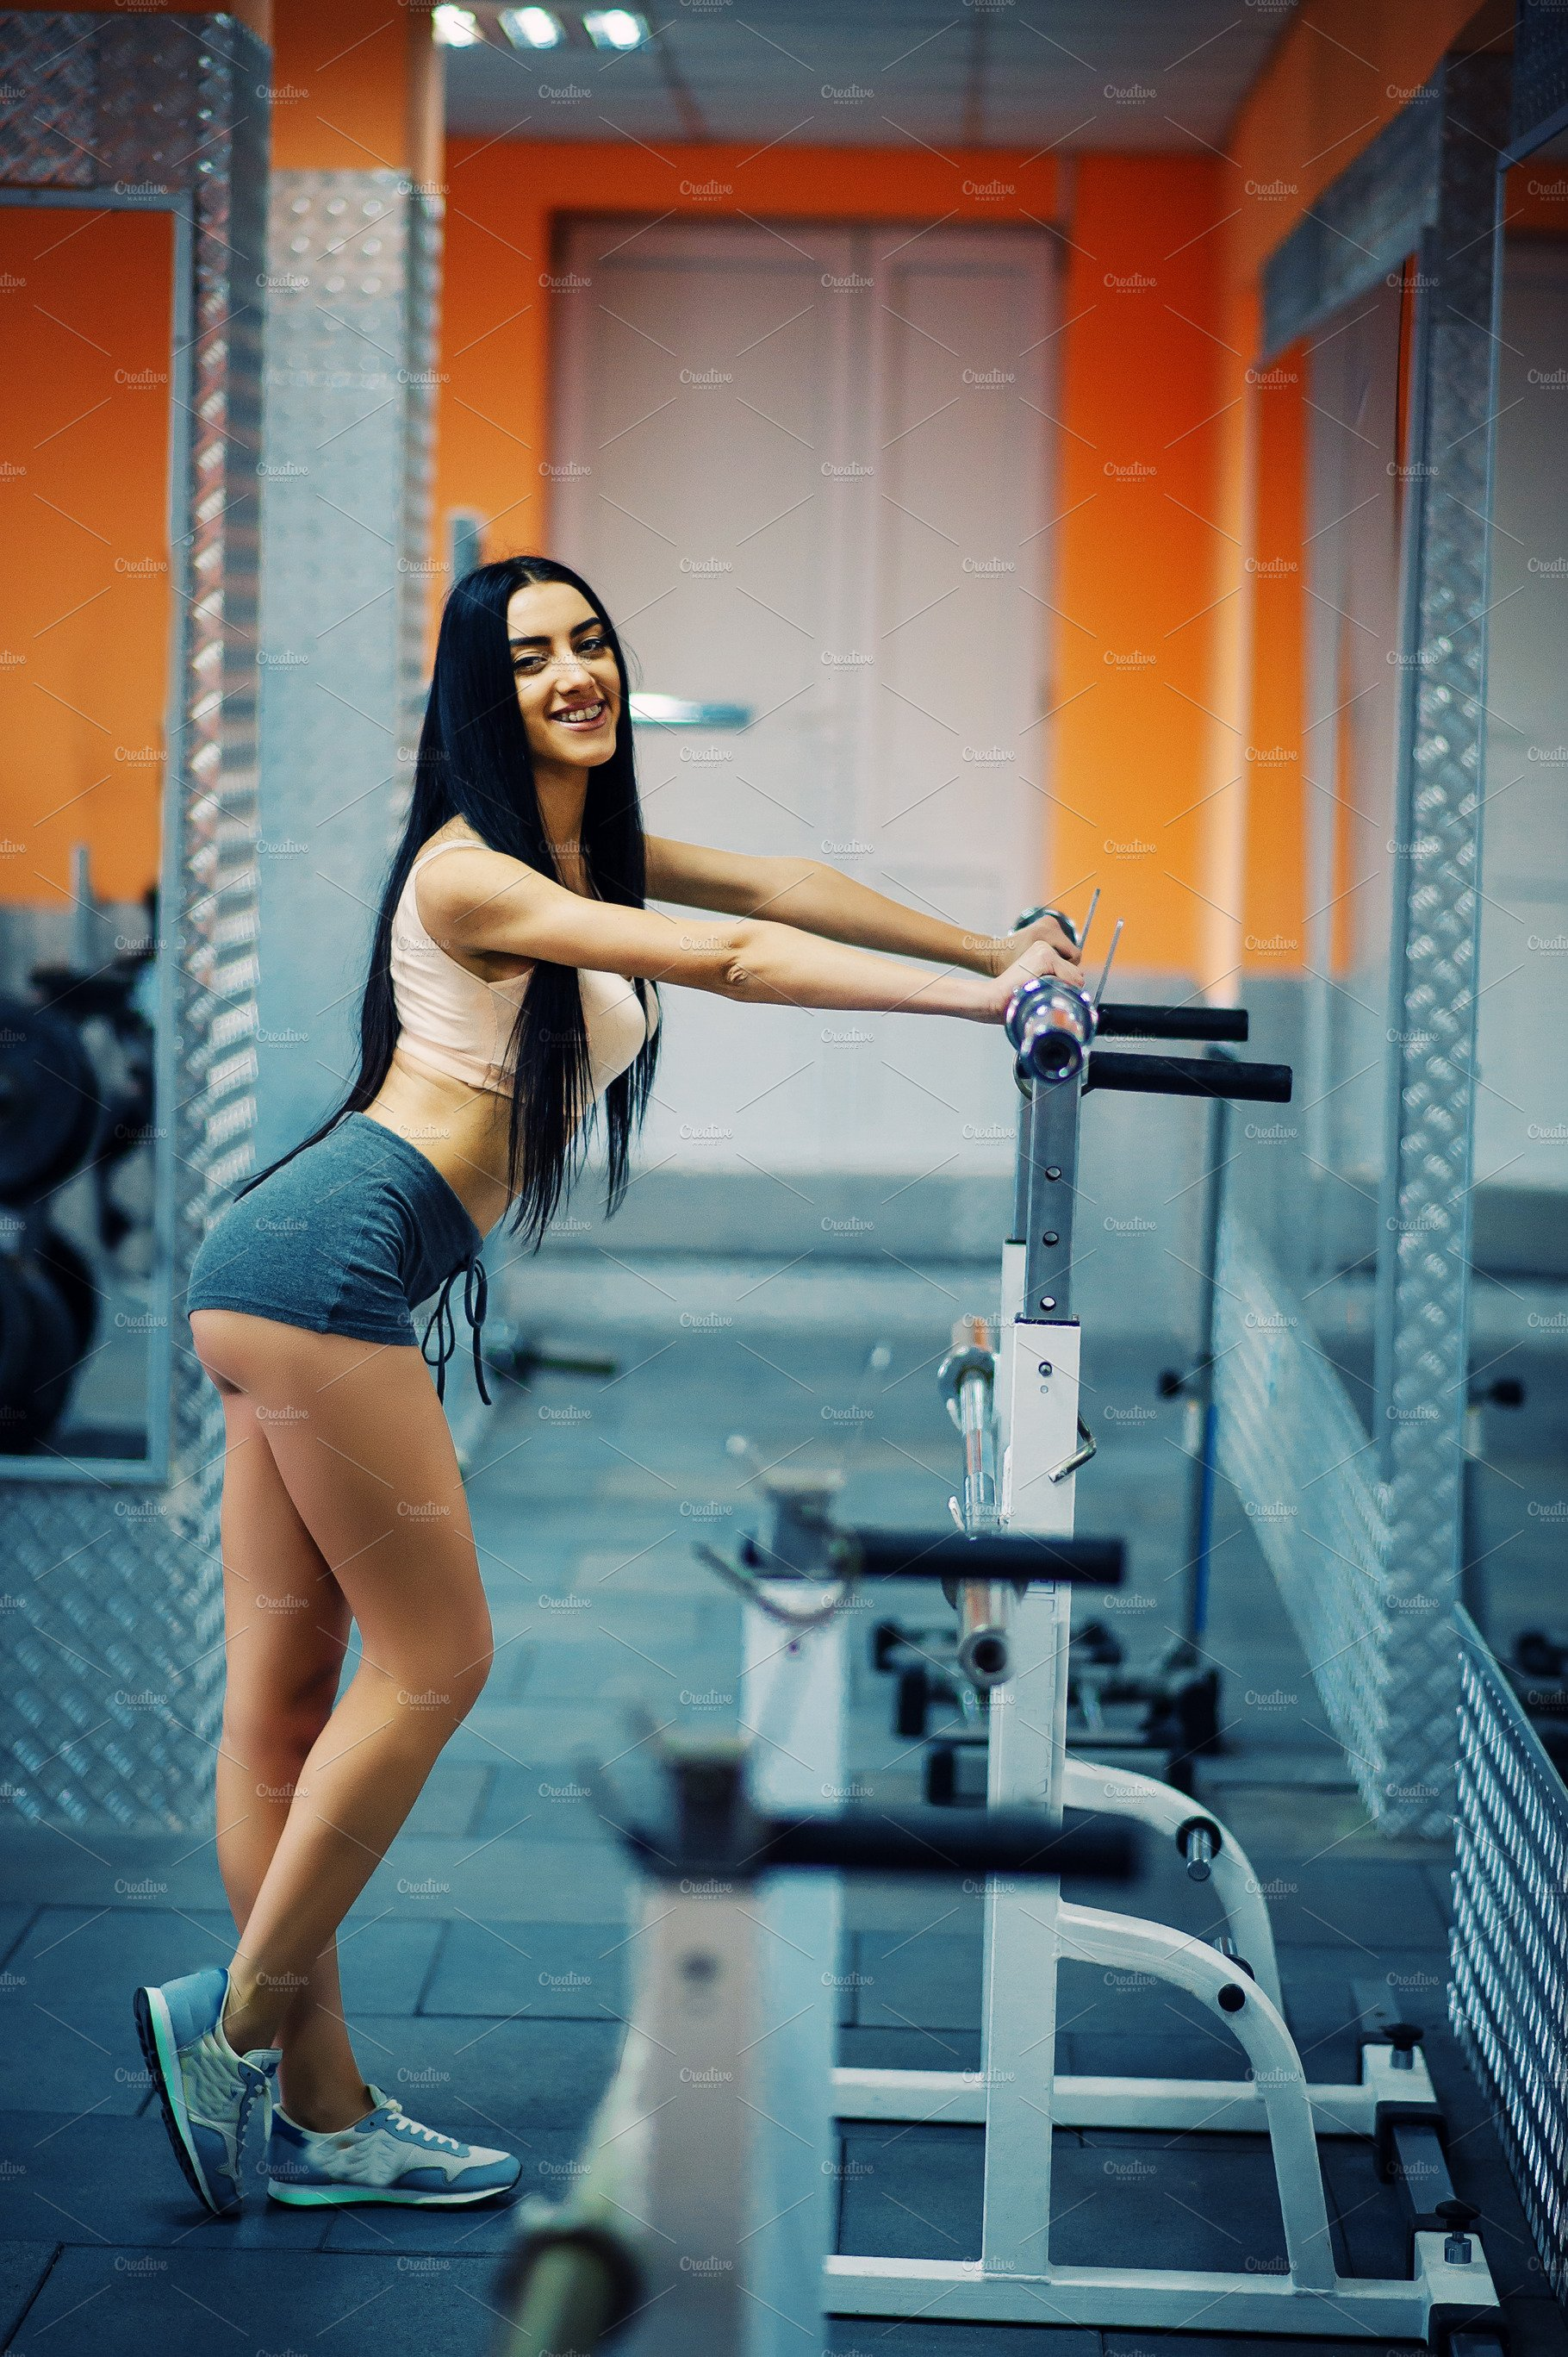 Hot Girls Who Watch Sports - Barnorama